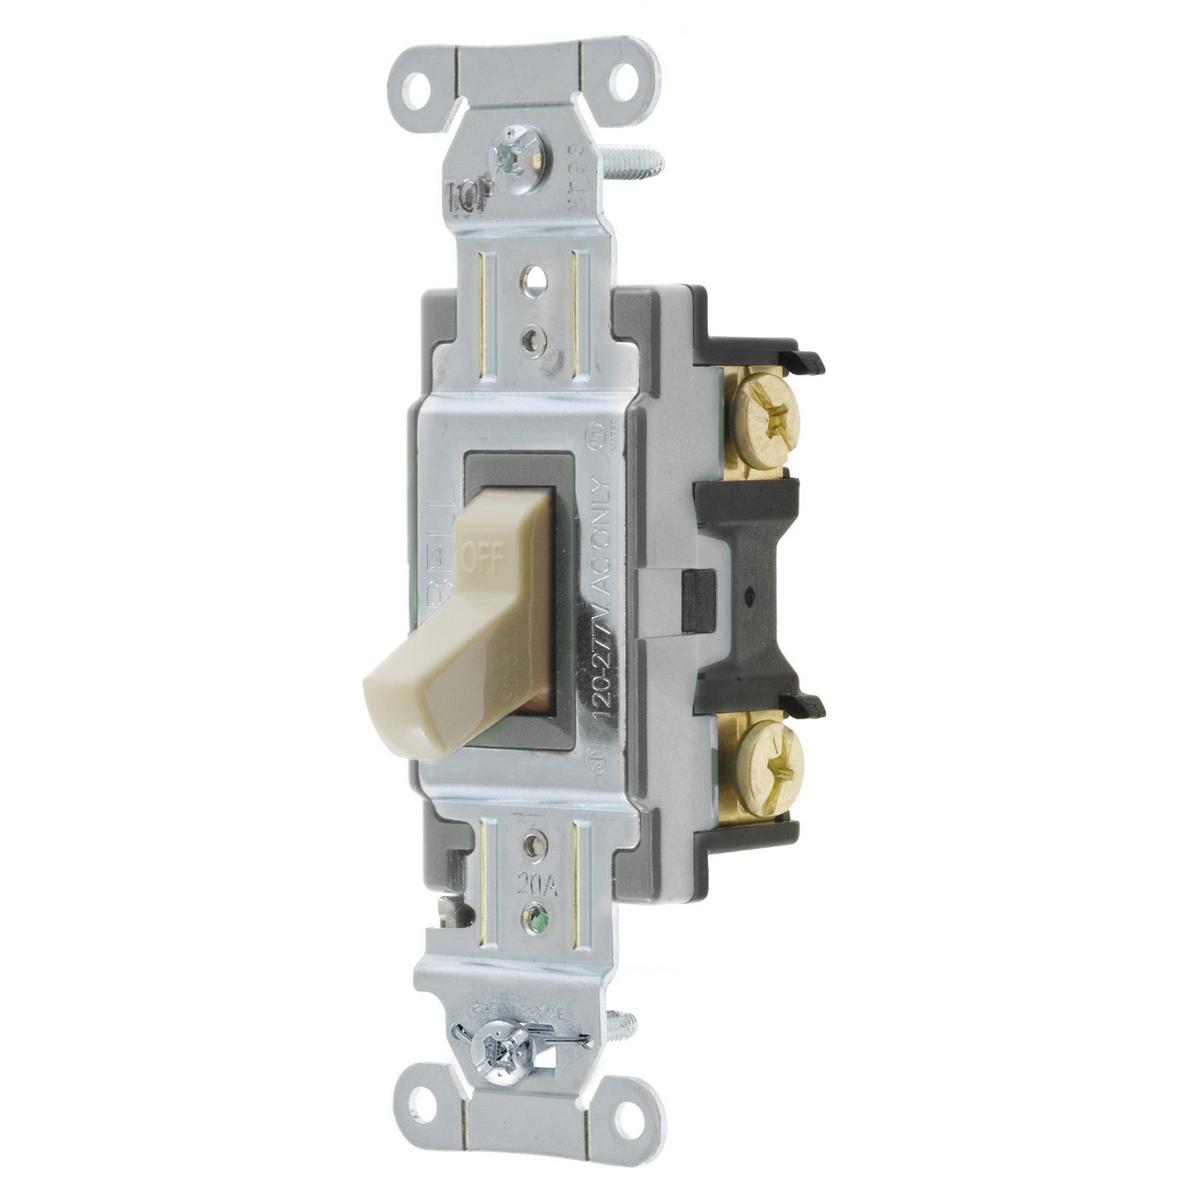 Hubbell CSB120I 20 Amp 120/277 VAC 1-Pole Ivory Toggle Switch